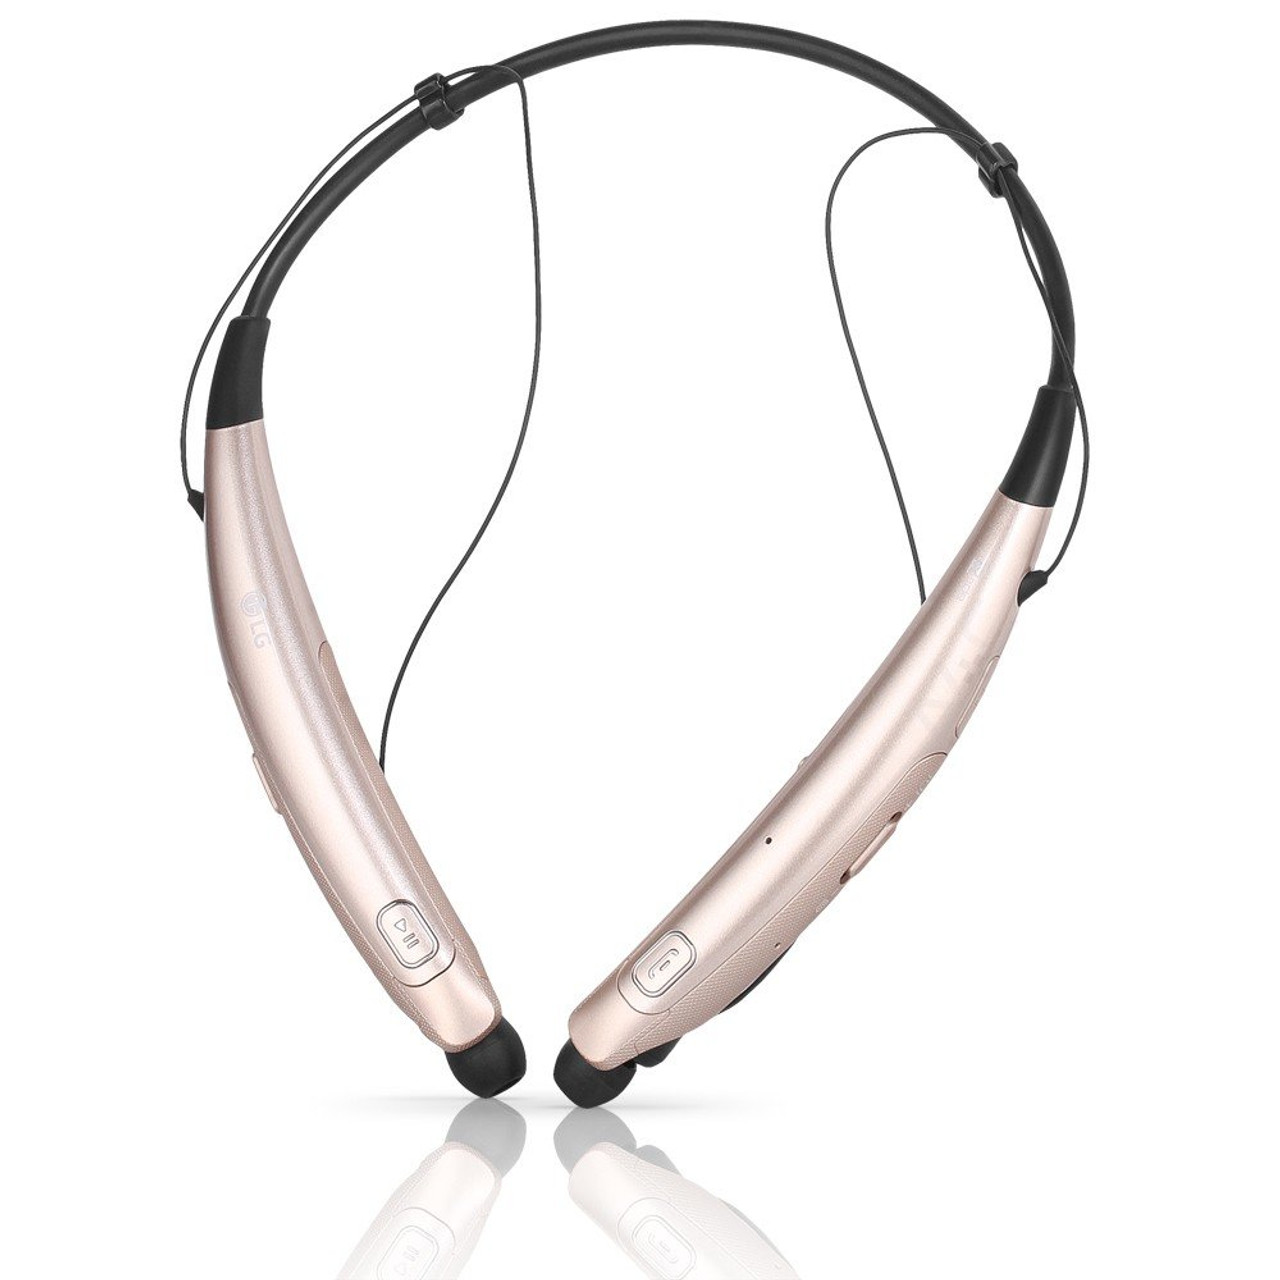 cc138518031 LG HBS-770 TONE PRO Wireless Bluetooth Stereo Headset (Gold ...